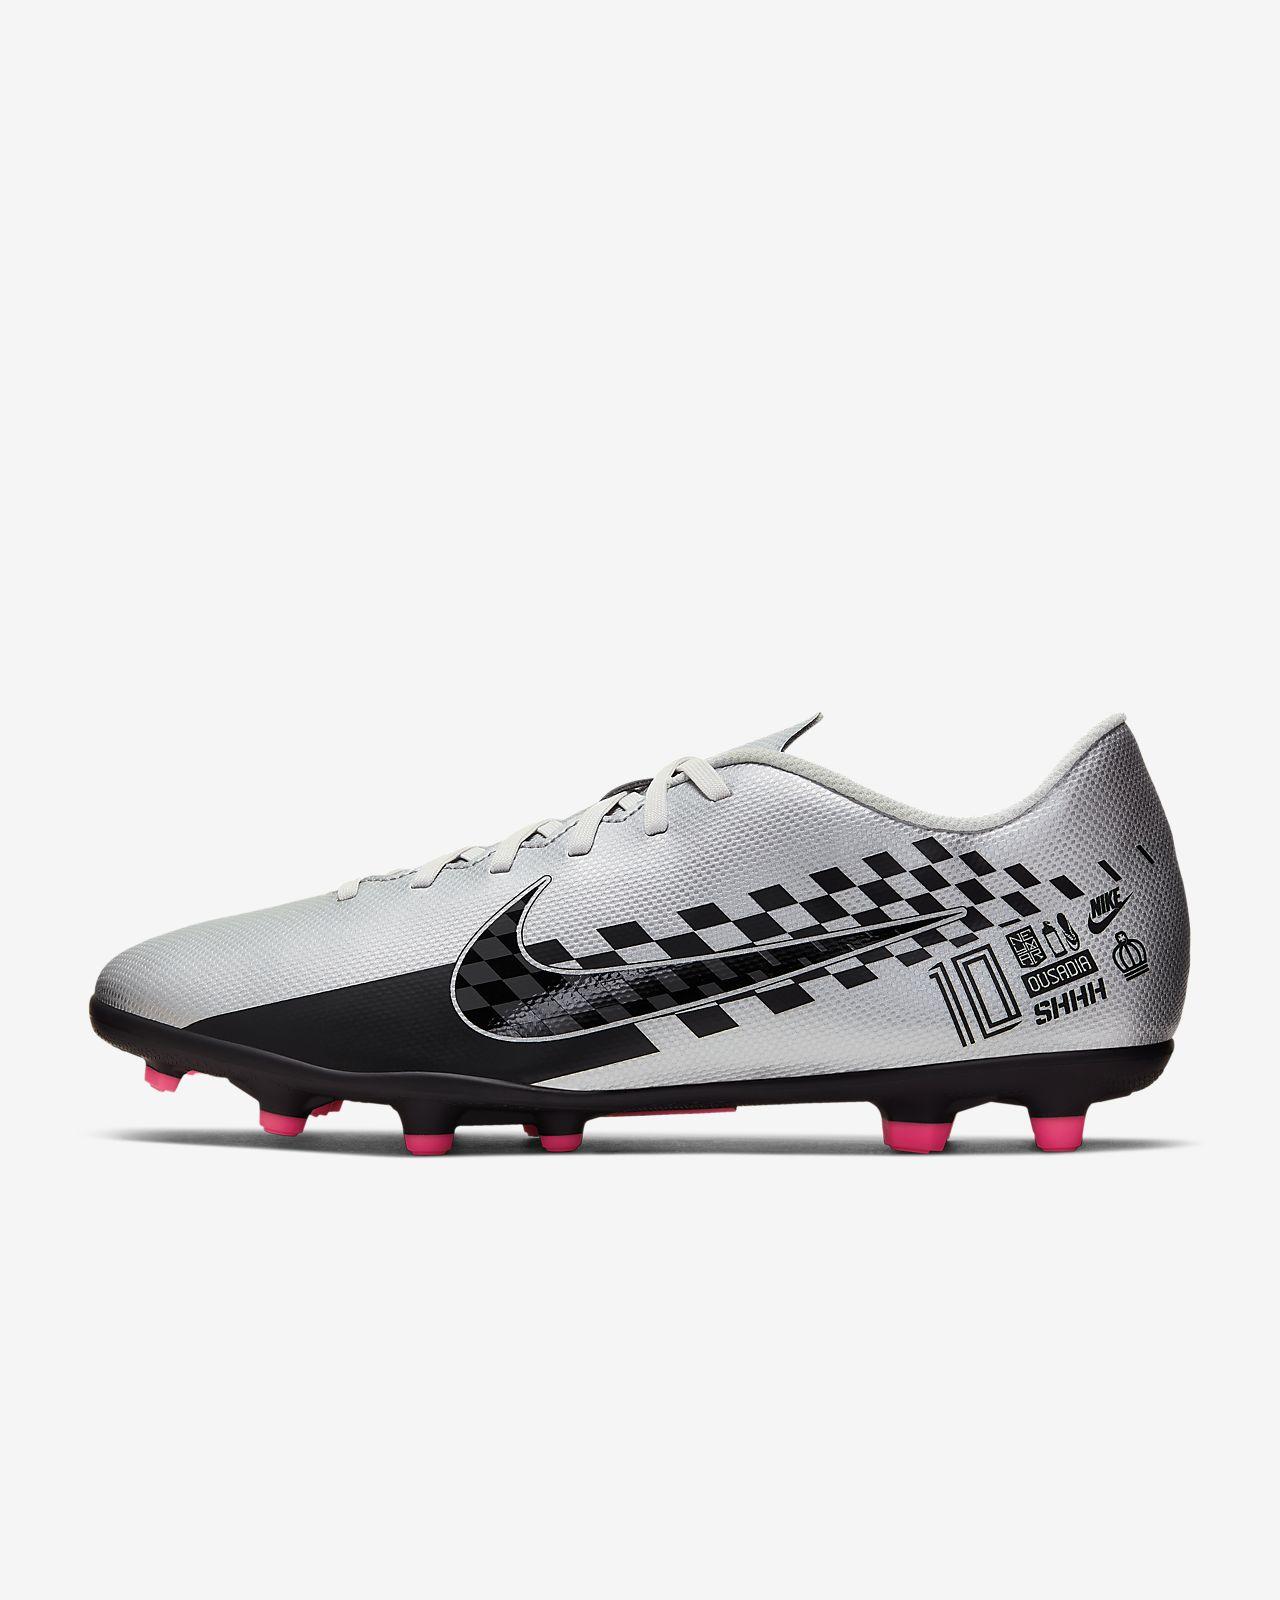 Chaussure de football à crampons multi-surfaces Nike Mercurial Vapor 13 Club Neymar Jr. MG